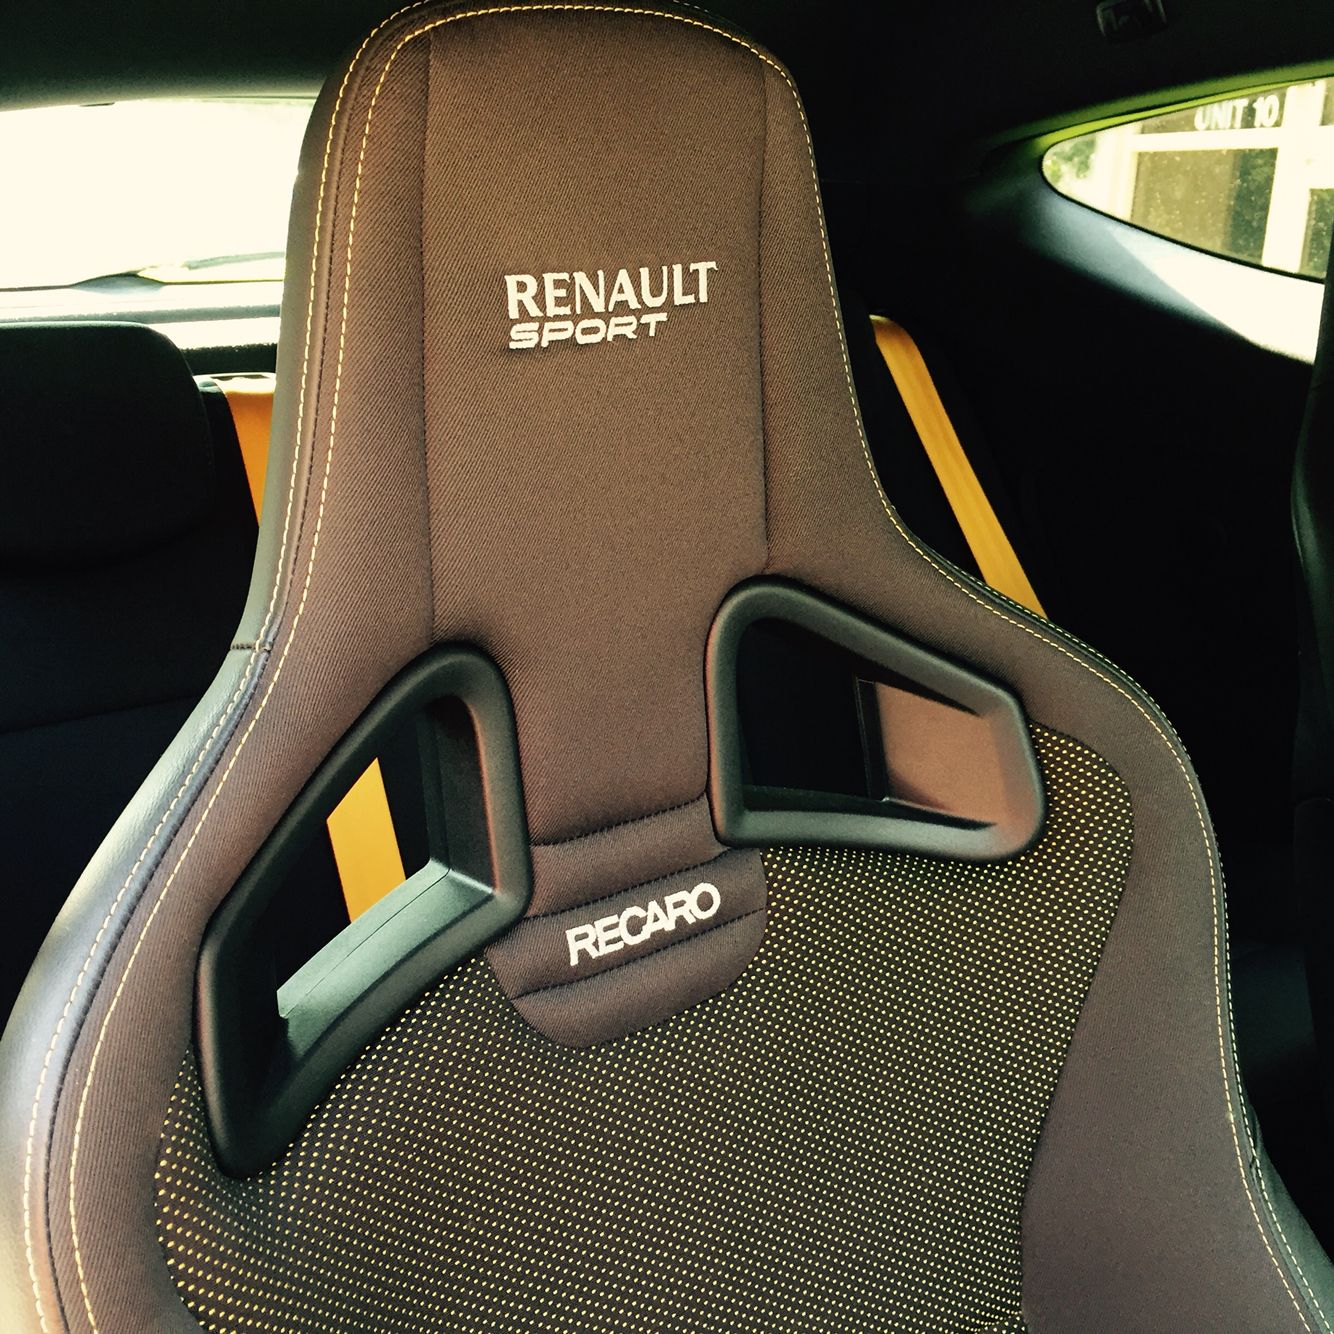 2014 Renault Megane R S 265 Limited Edition Spmotors Carsales Gumtree Carsguide Roadandtrack Renault Renaultsport Recaro Renault Megane Recaro Renault